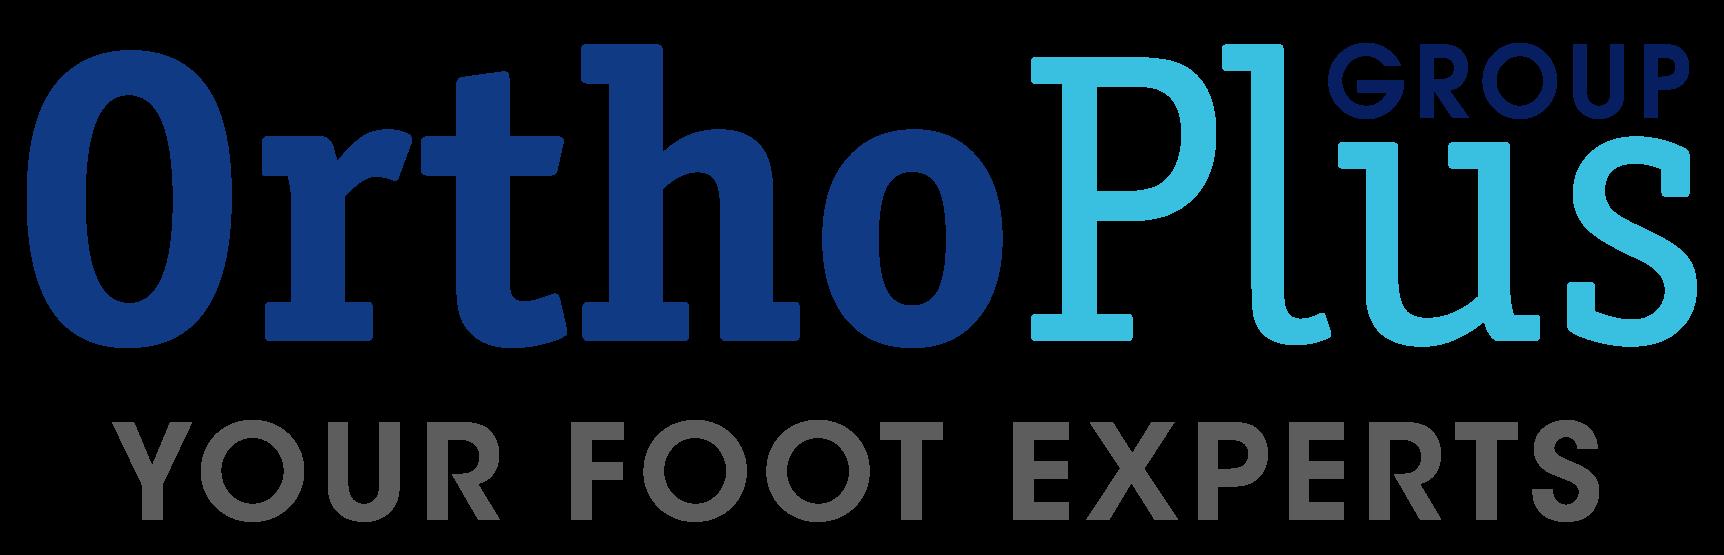 OrthoPlus Group